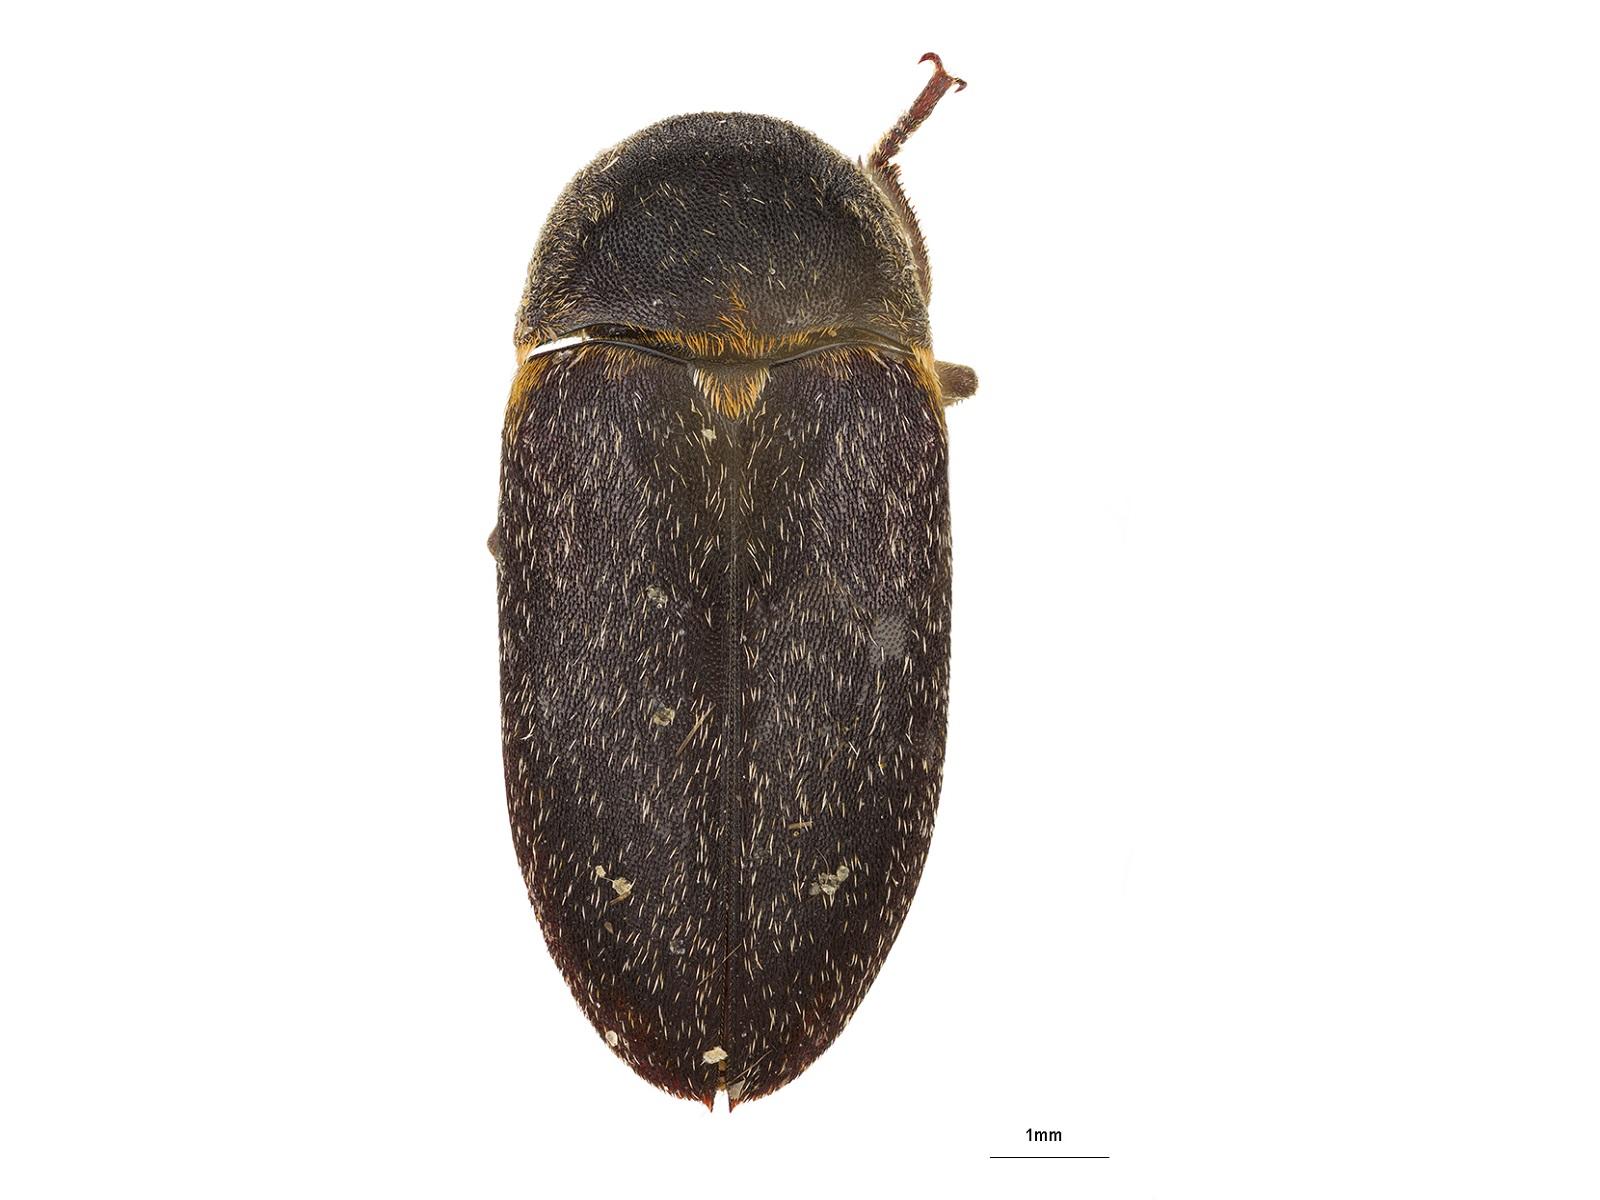 DermestesmaculatusDeGeer, 1774